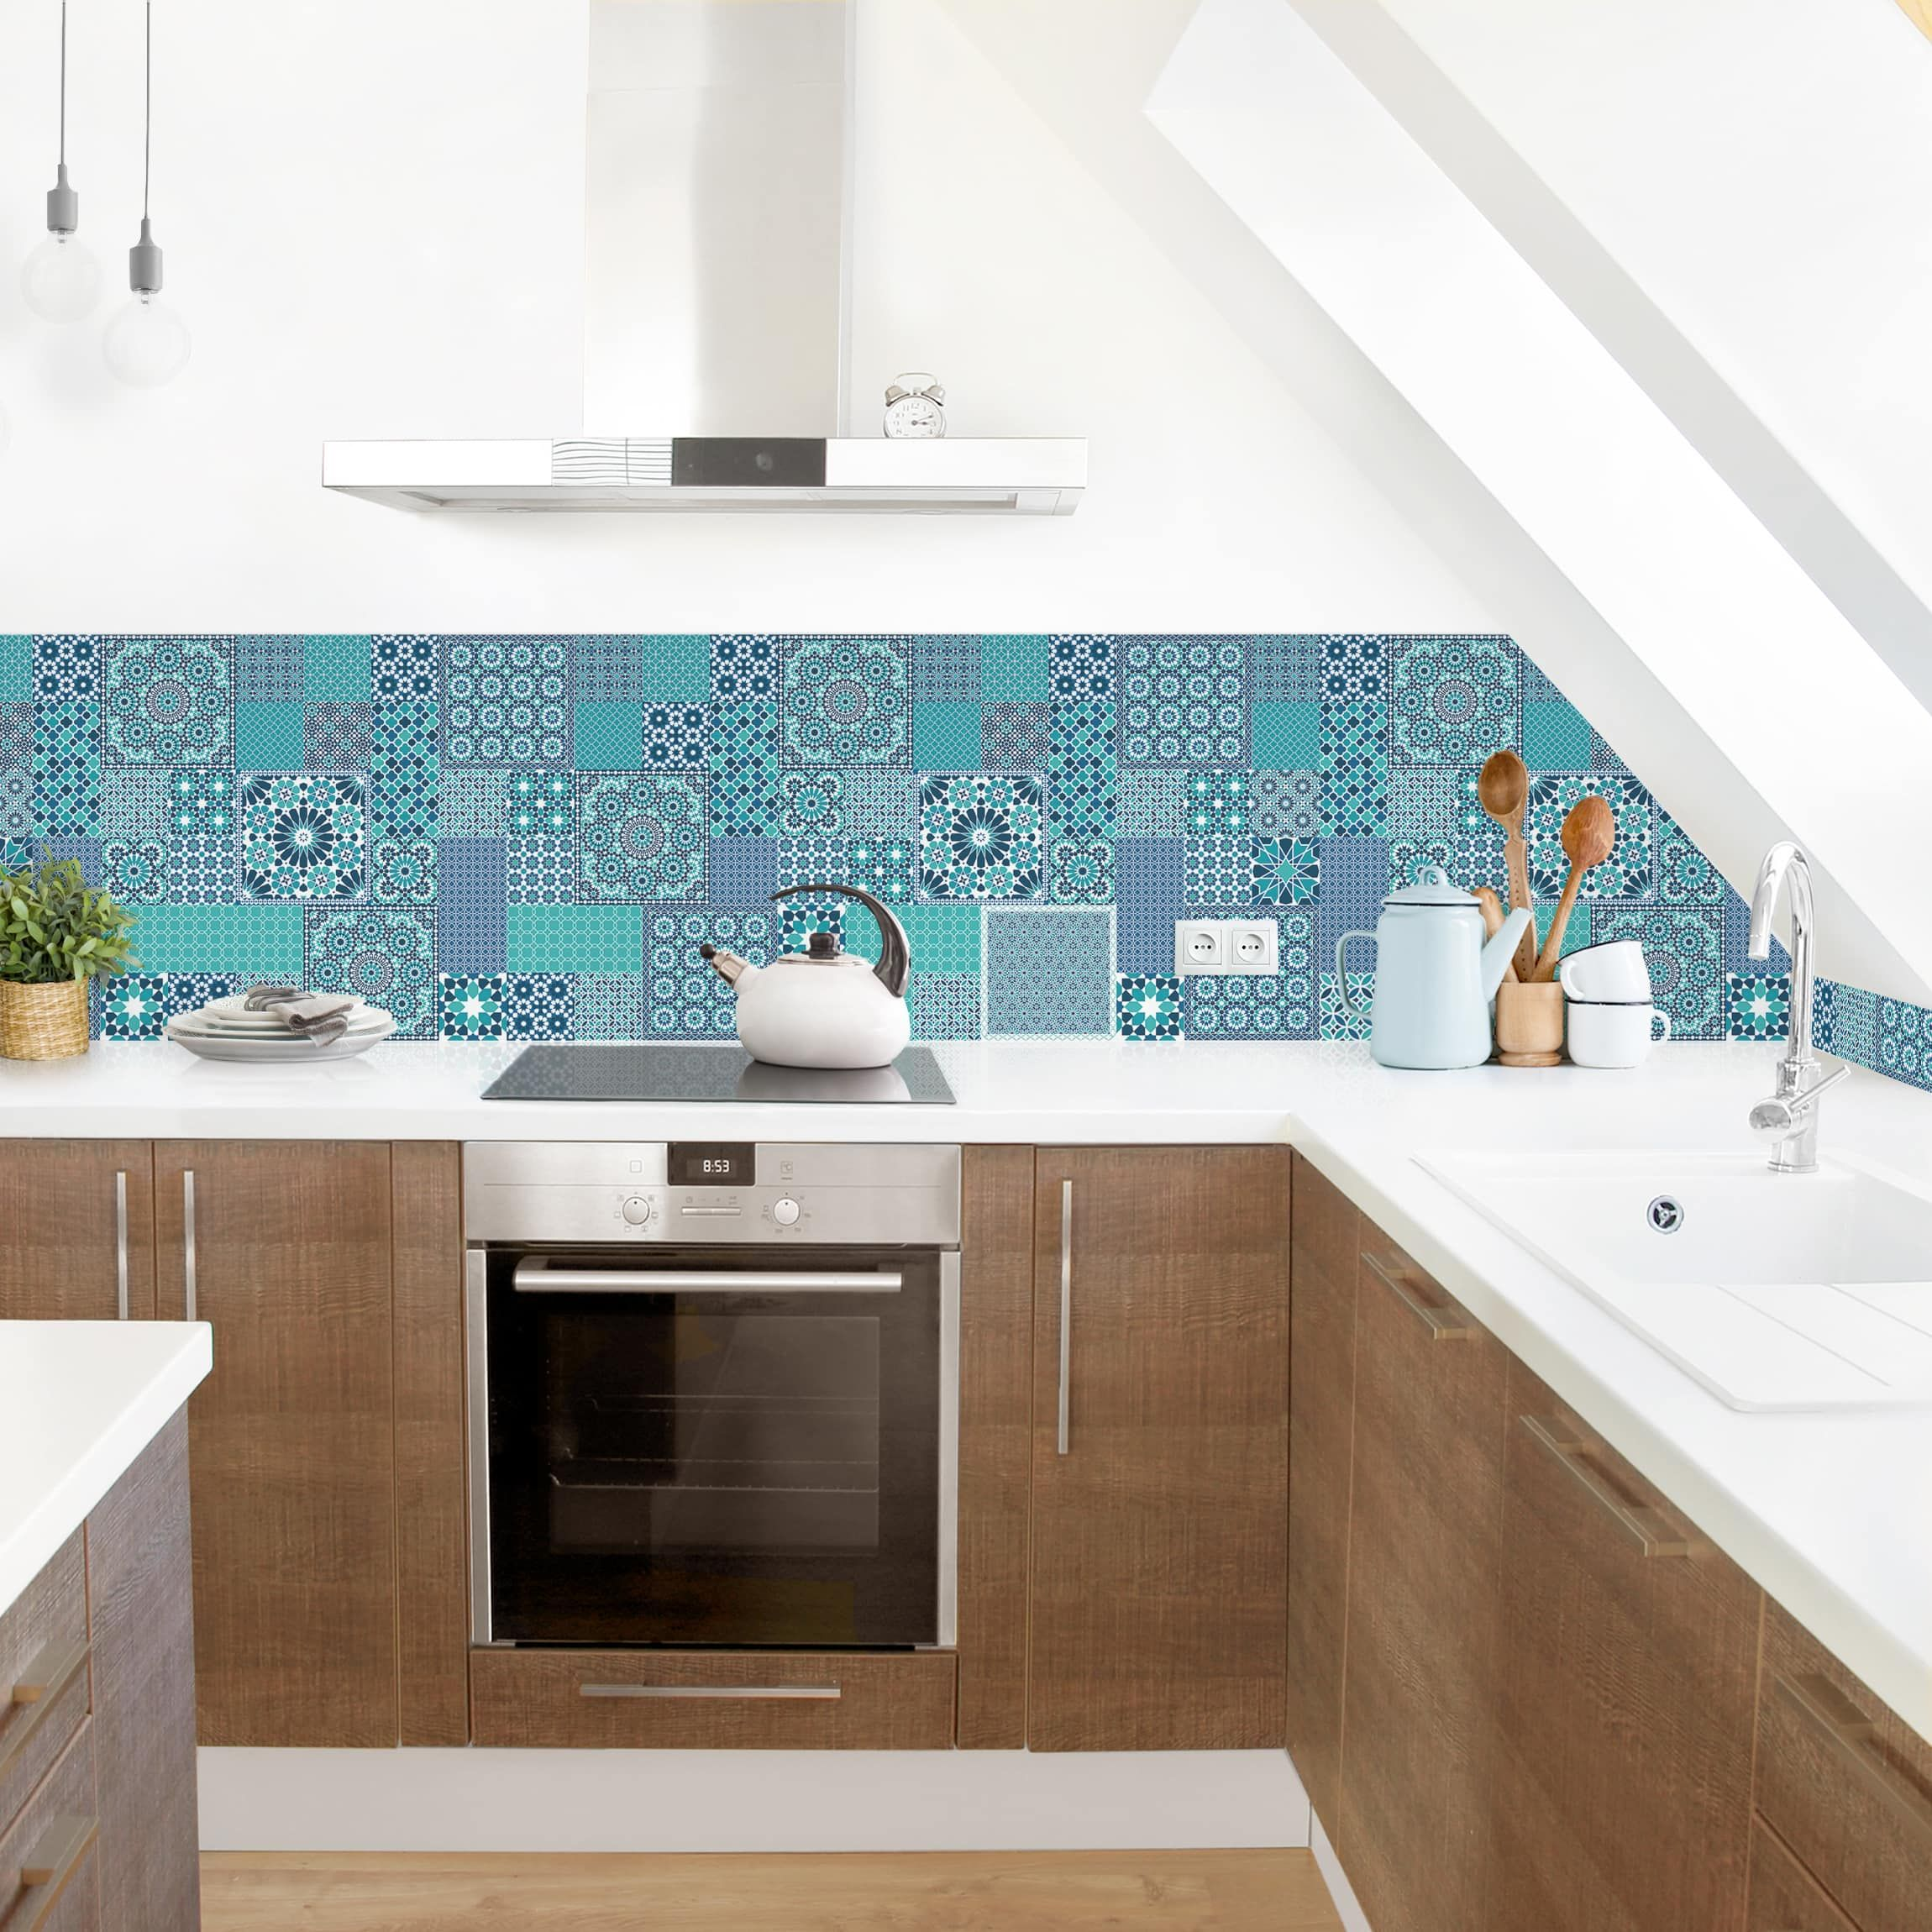 Rivestimento cucina - Mosaici marocchini turchese | Cucina ...